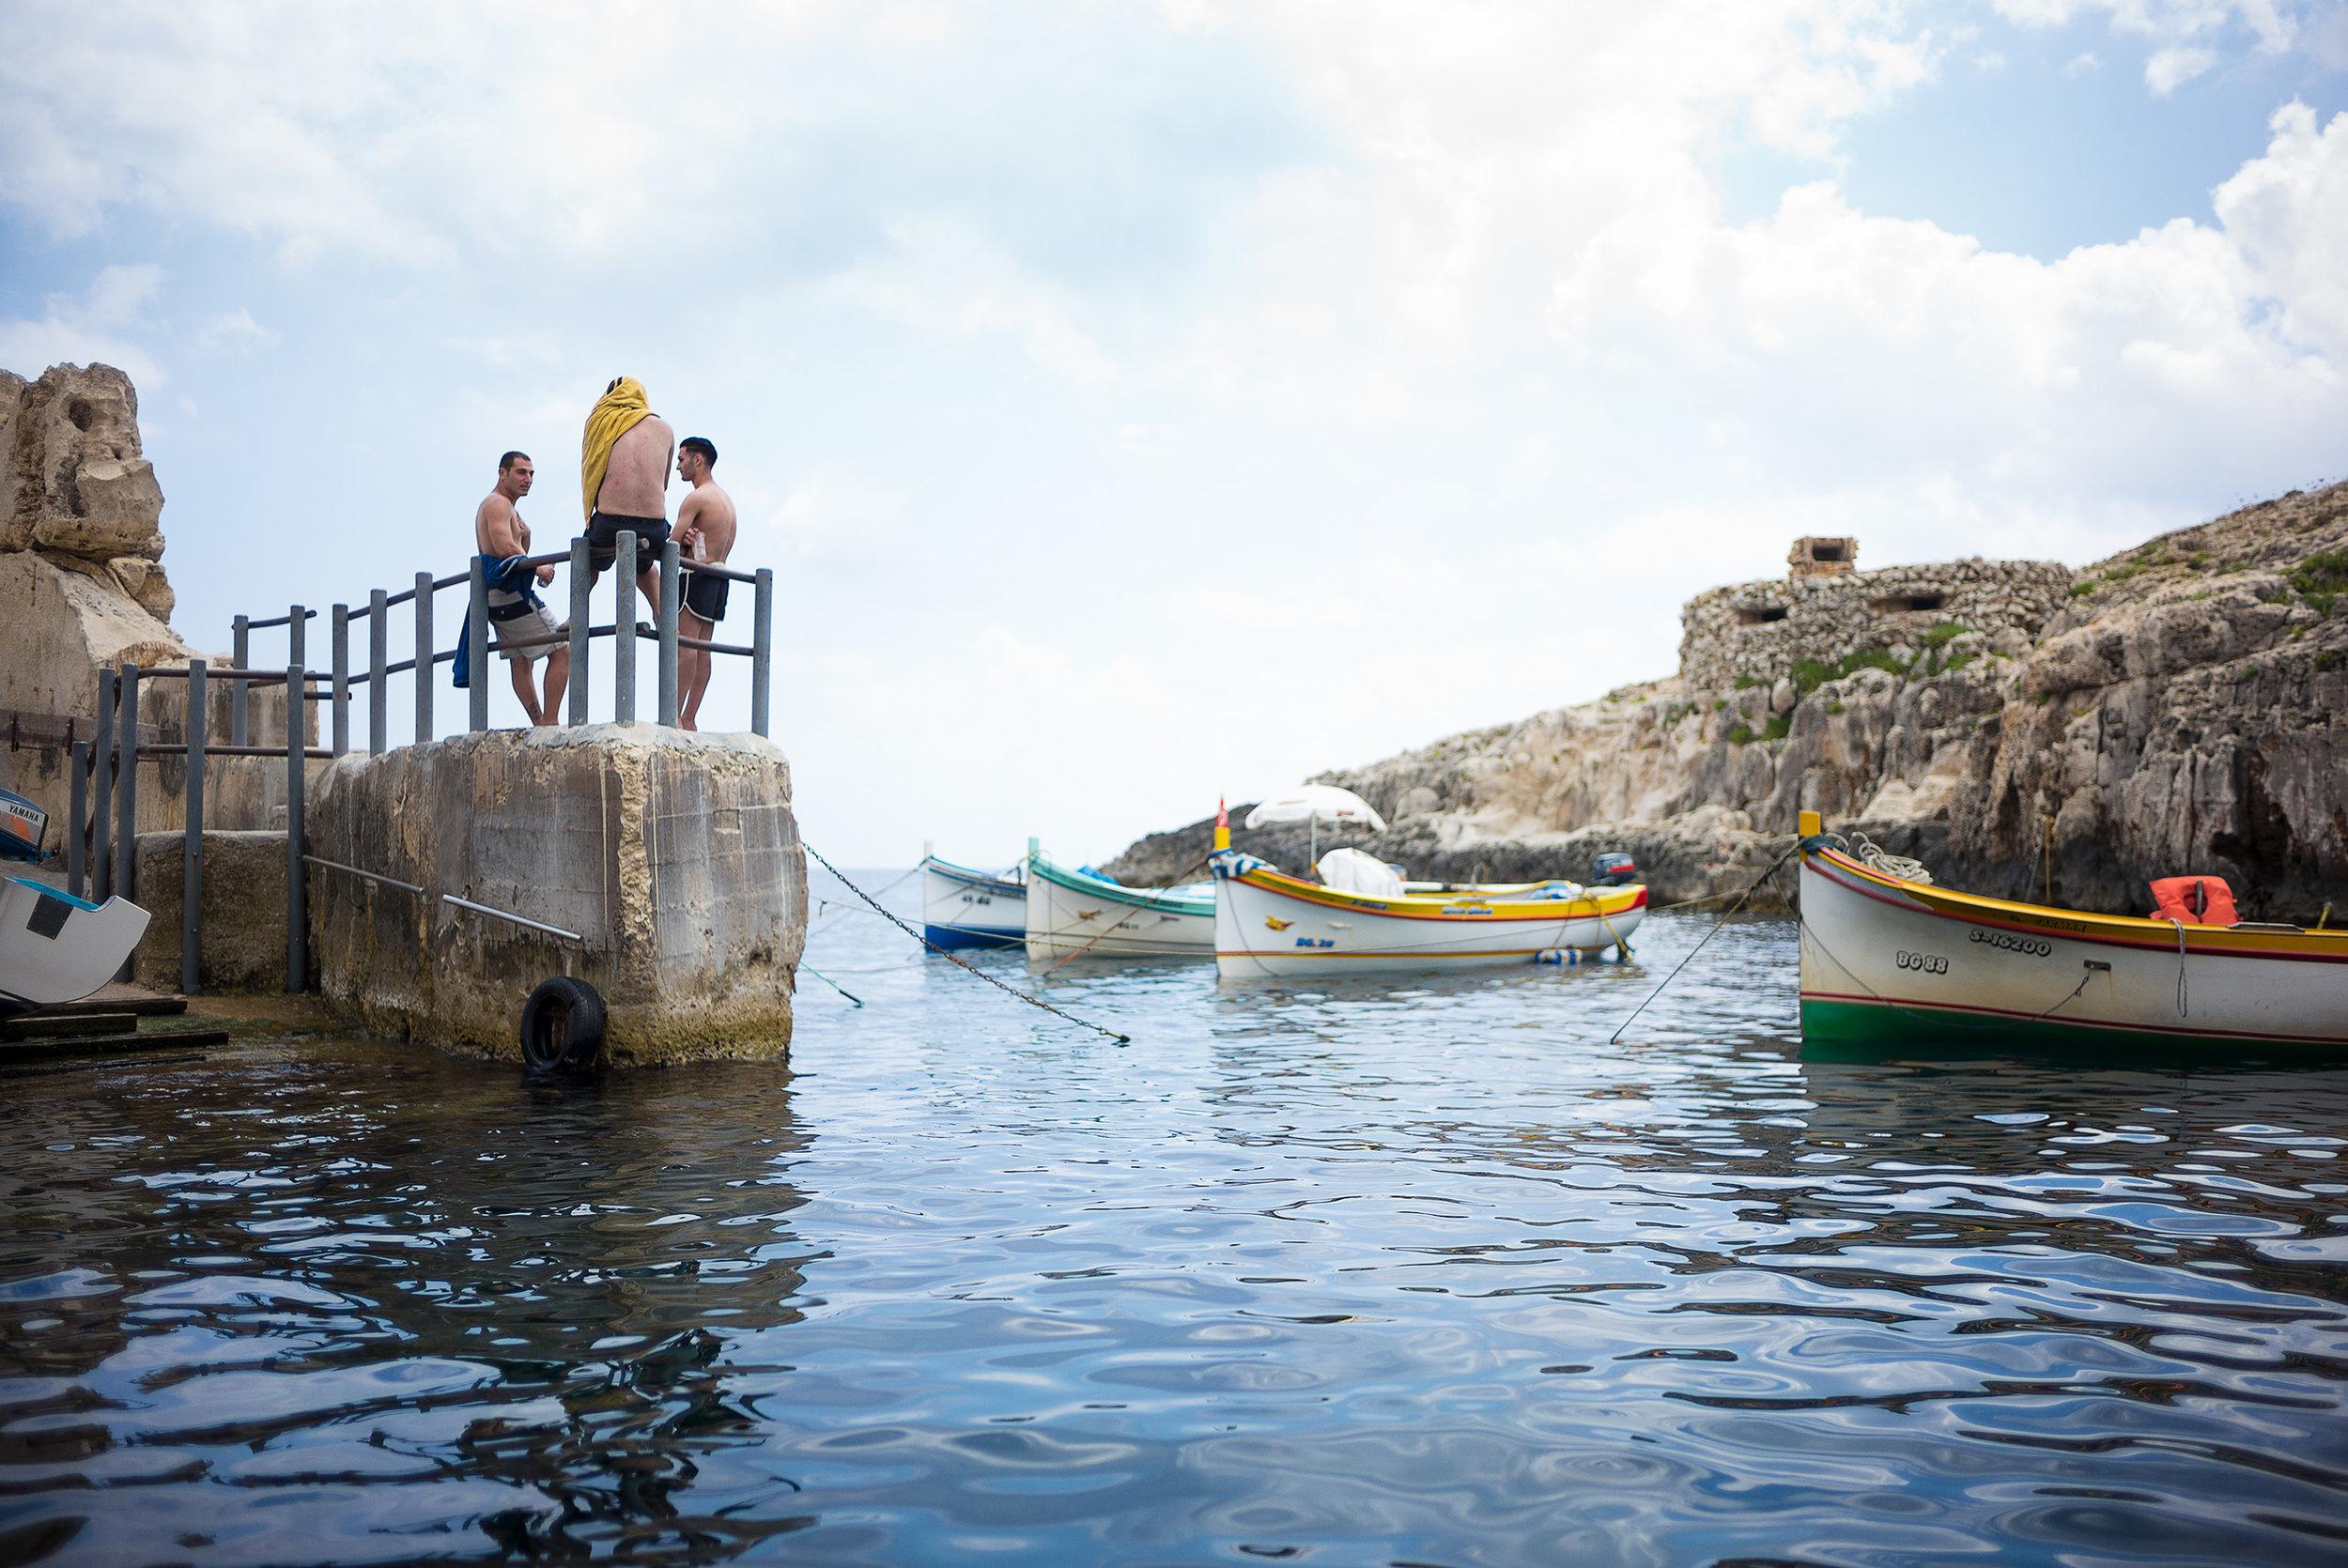 Malta 2017 by Eric Berger